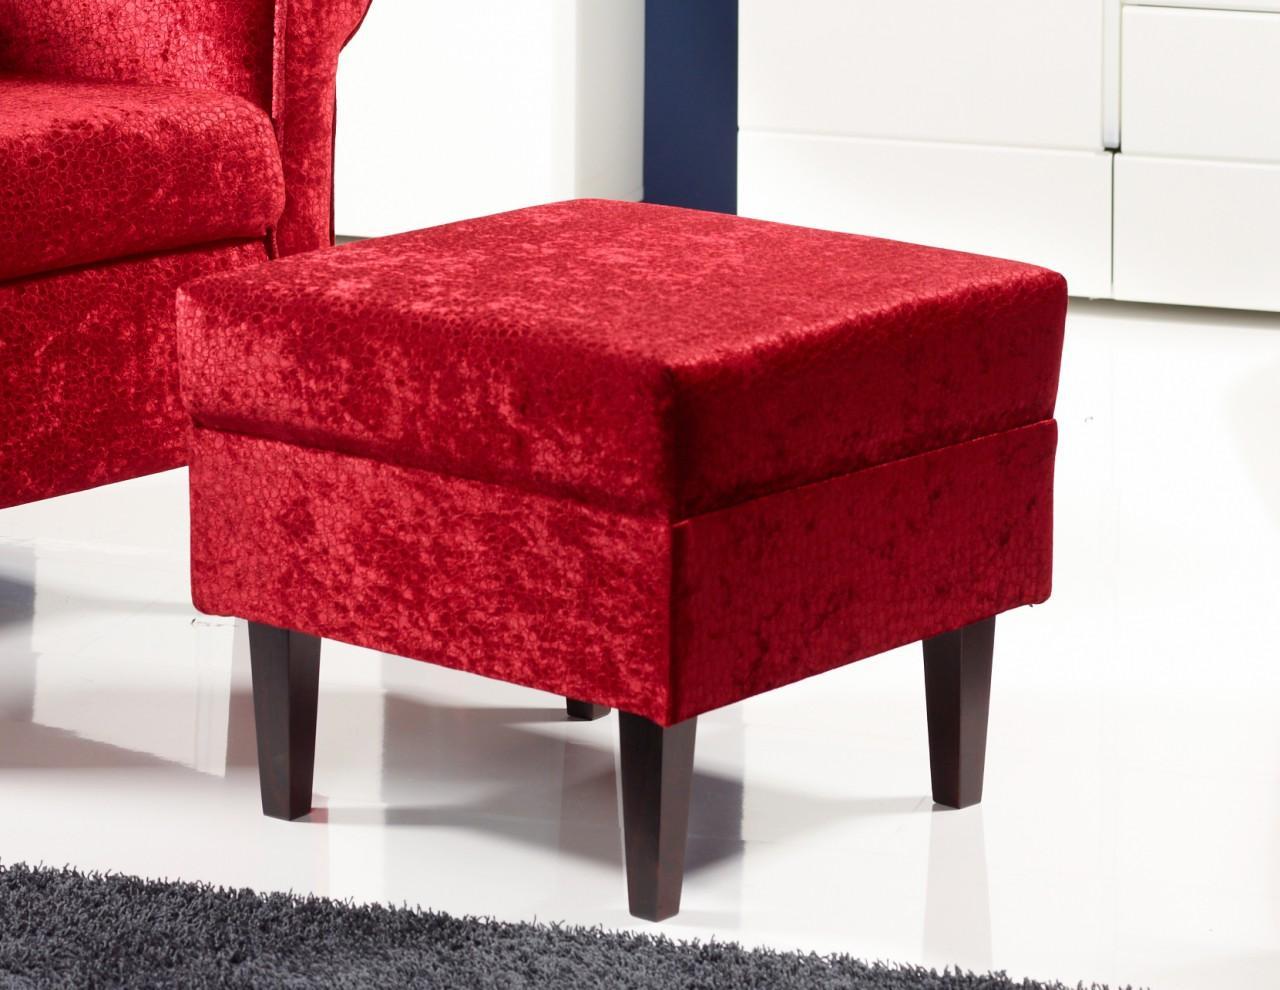 pazzo bremshebel preis vergleich 2016. Black Bedroom Furniture Sets. Home Design Ideas